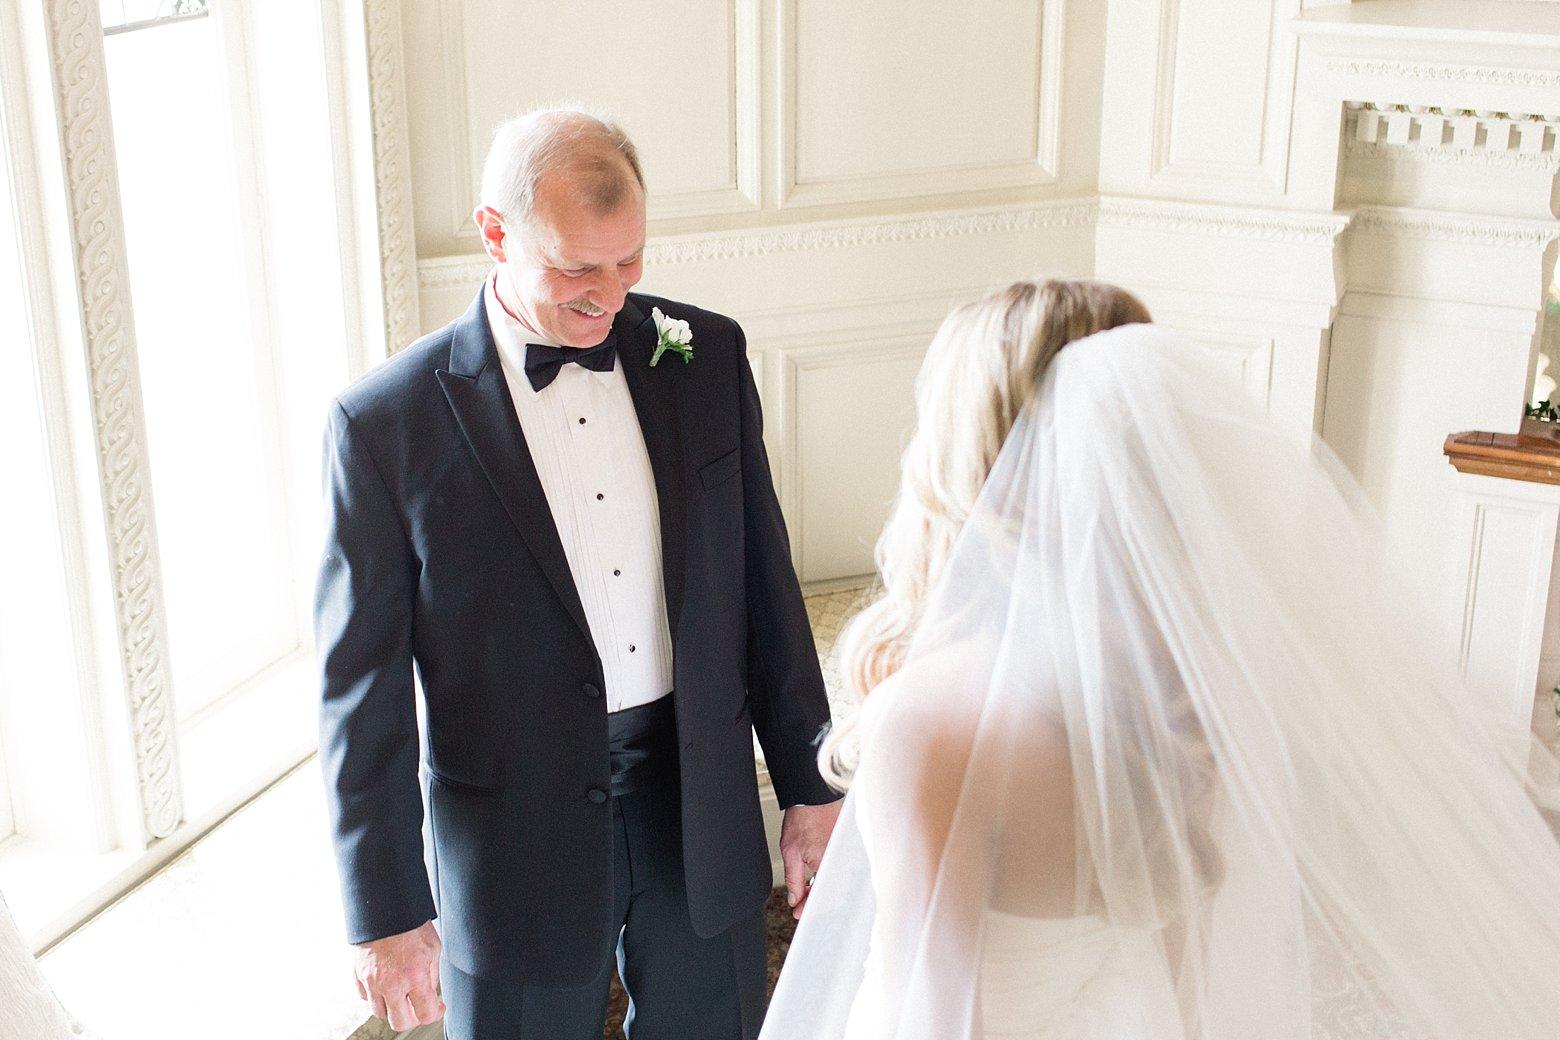 lauren_fair_photography_april_lynn_designs_stasia_matt_spring_cairnwood_estate_wedding_northeast_philadelphia_blush_pink_gold_wedding_invitation_stationery_0036